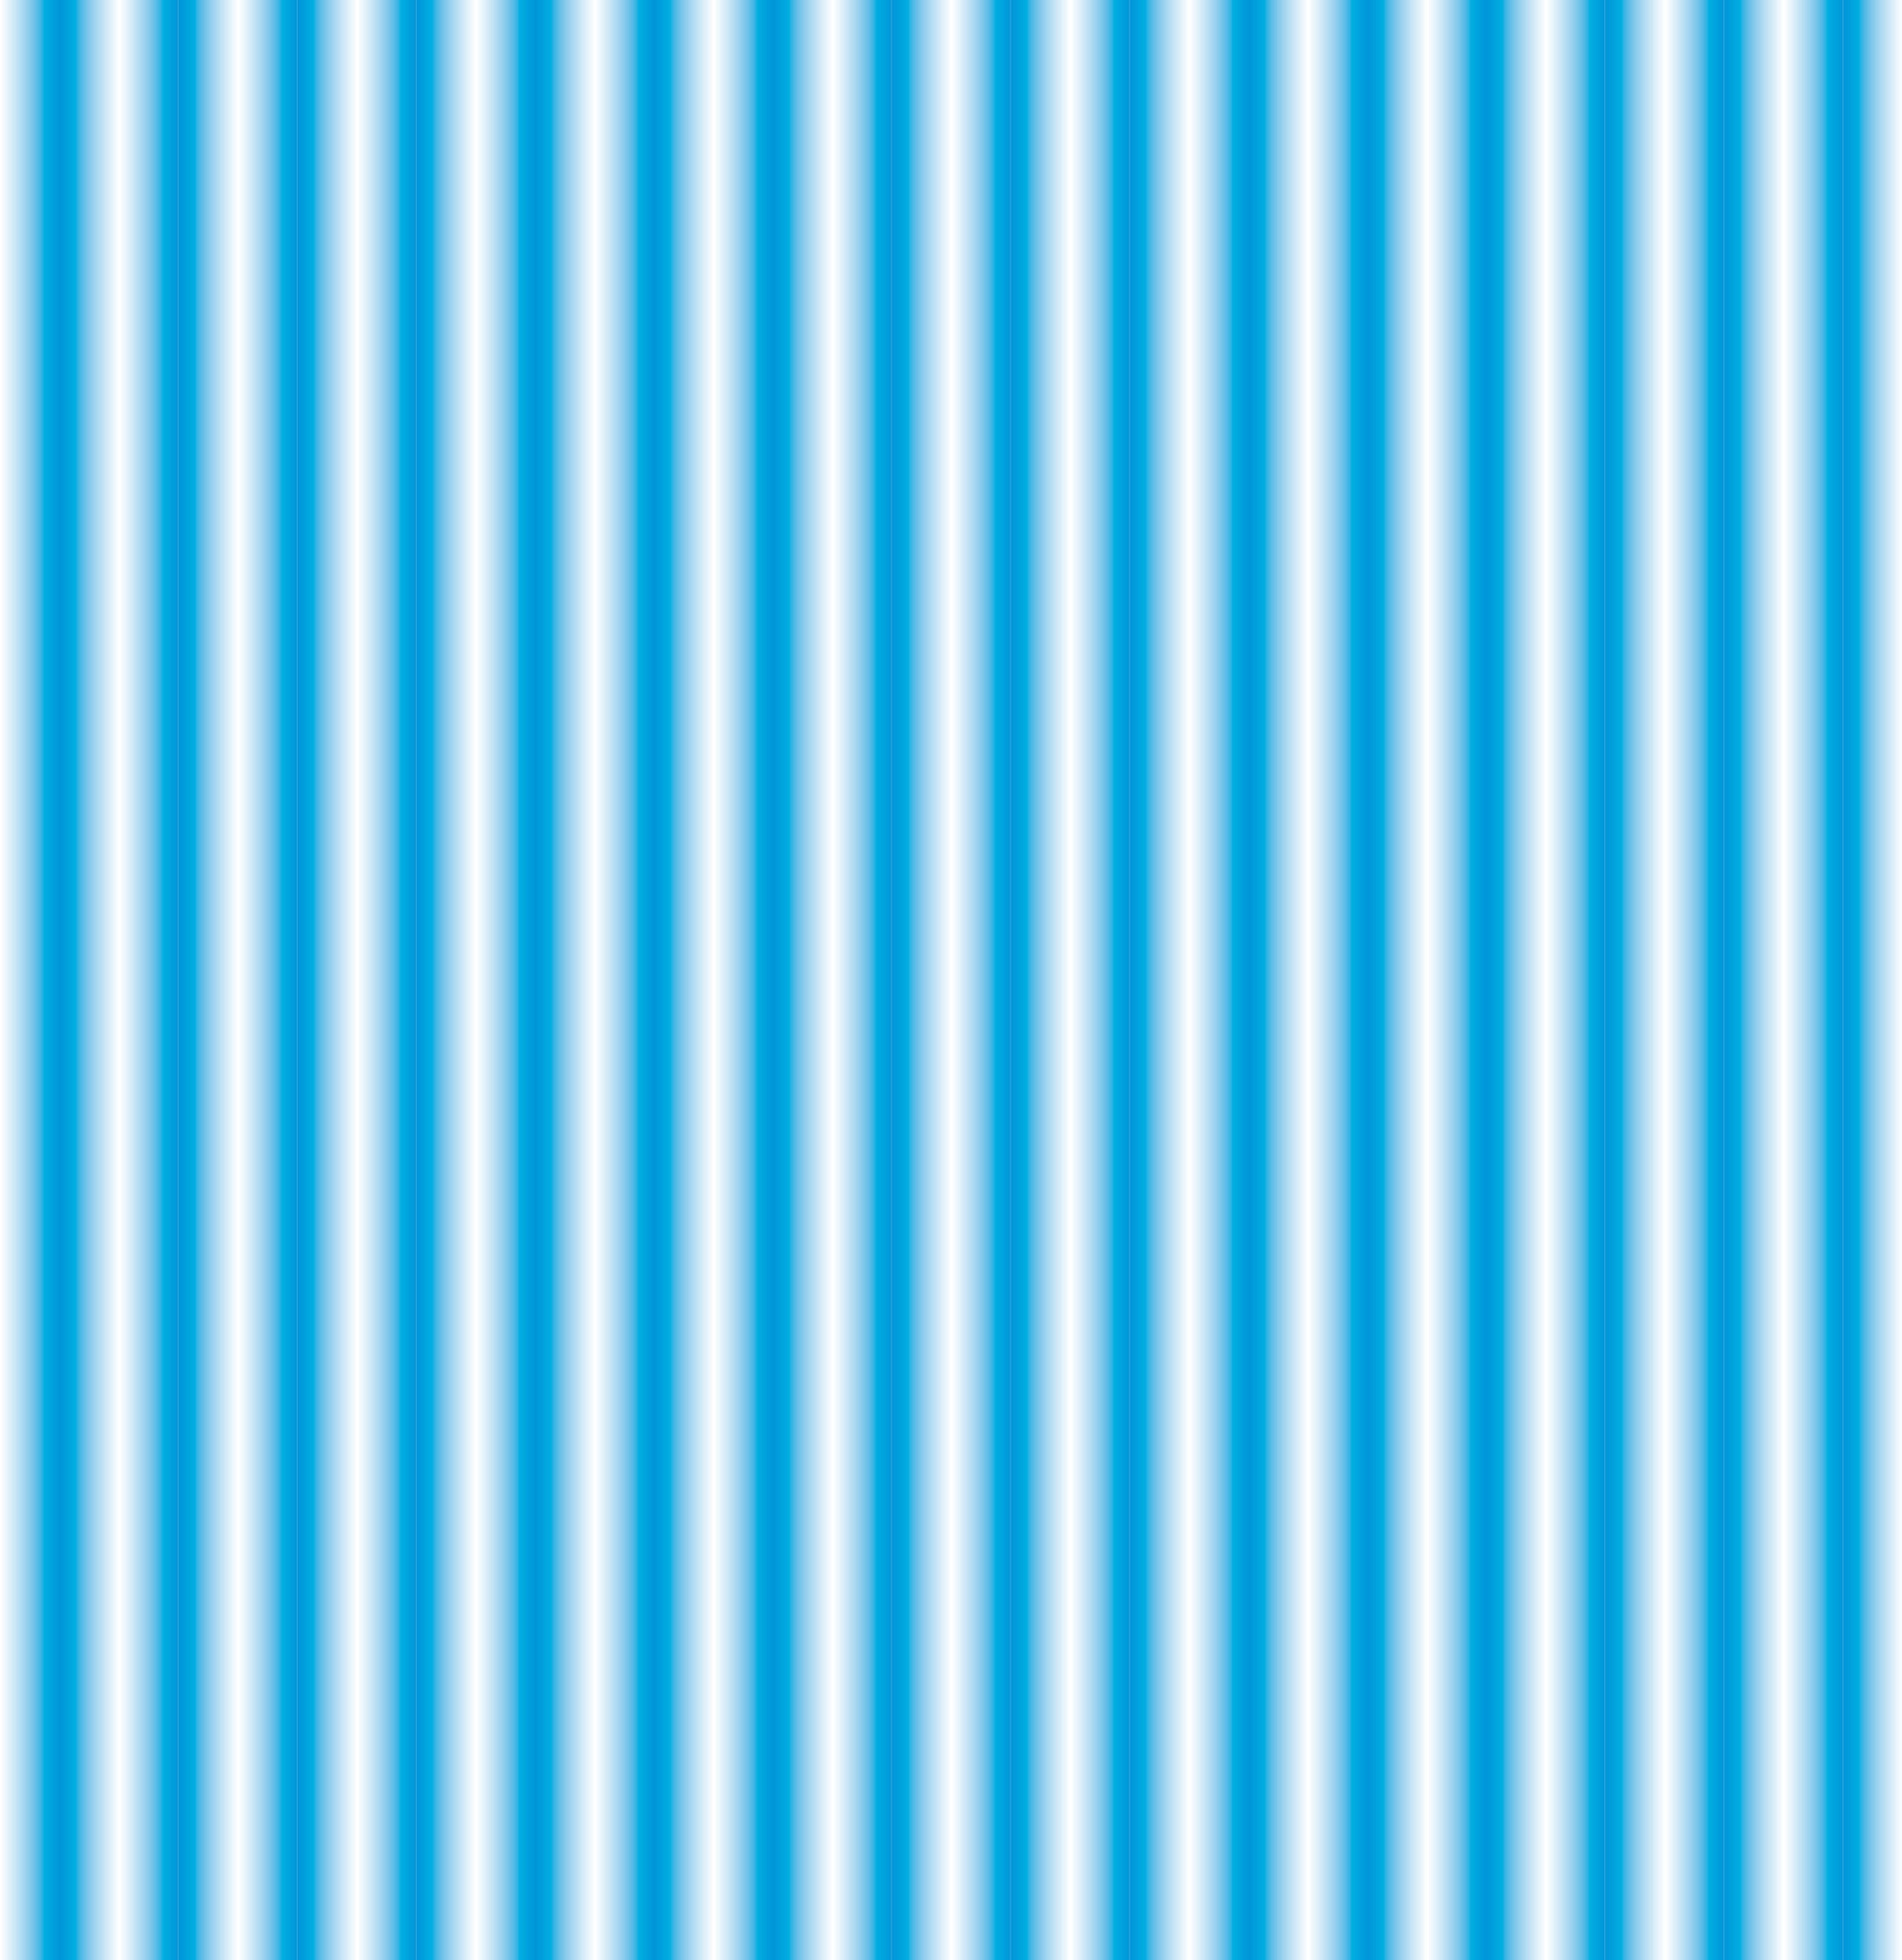 Striped wallpaper design in blue and white 1999x2060